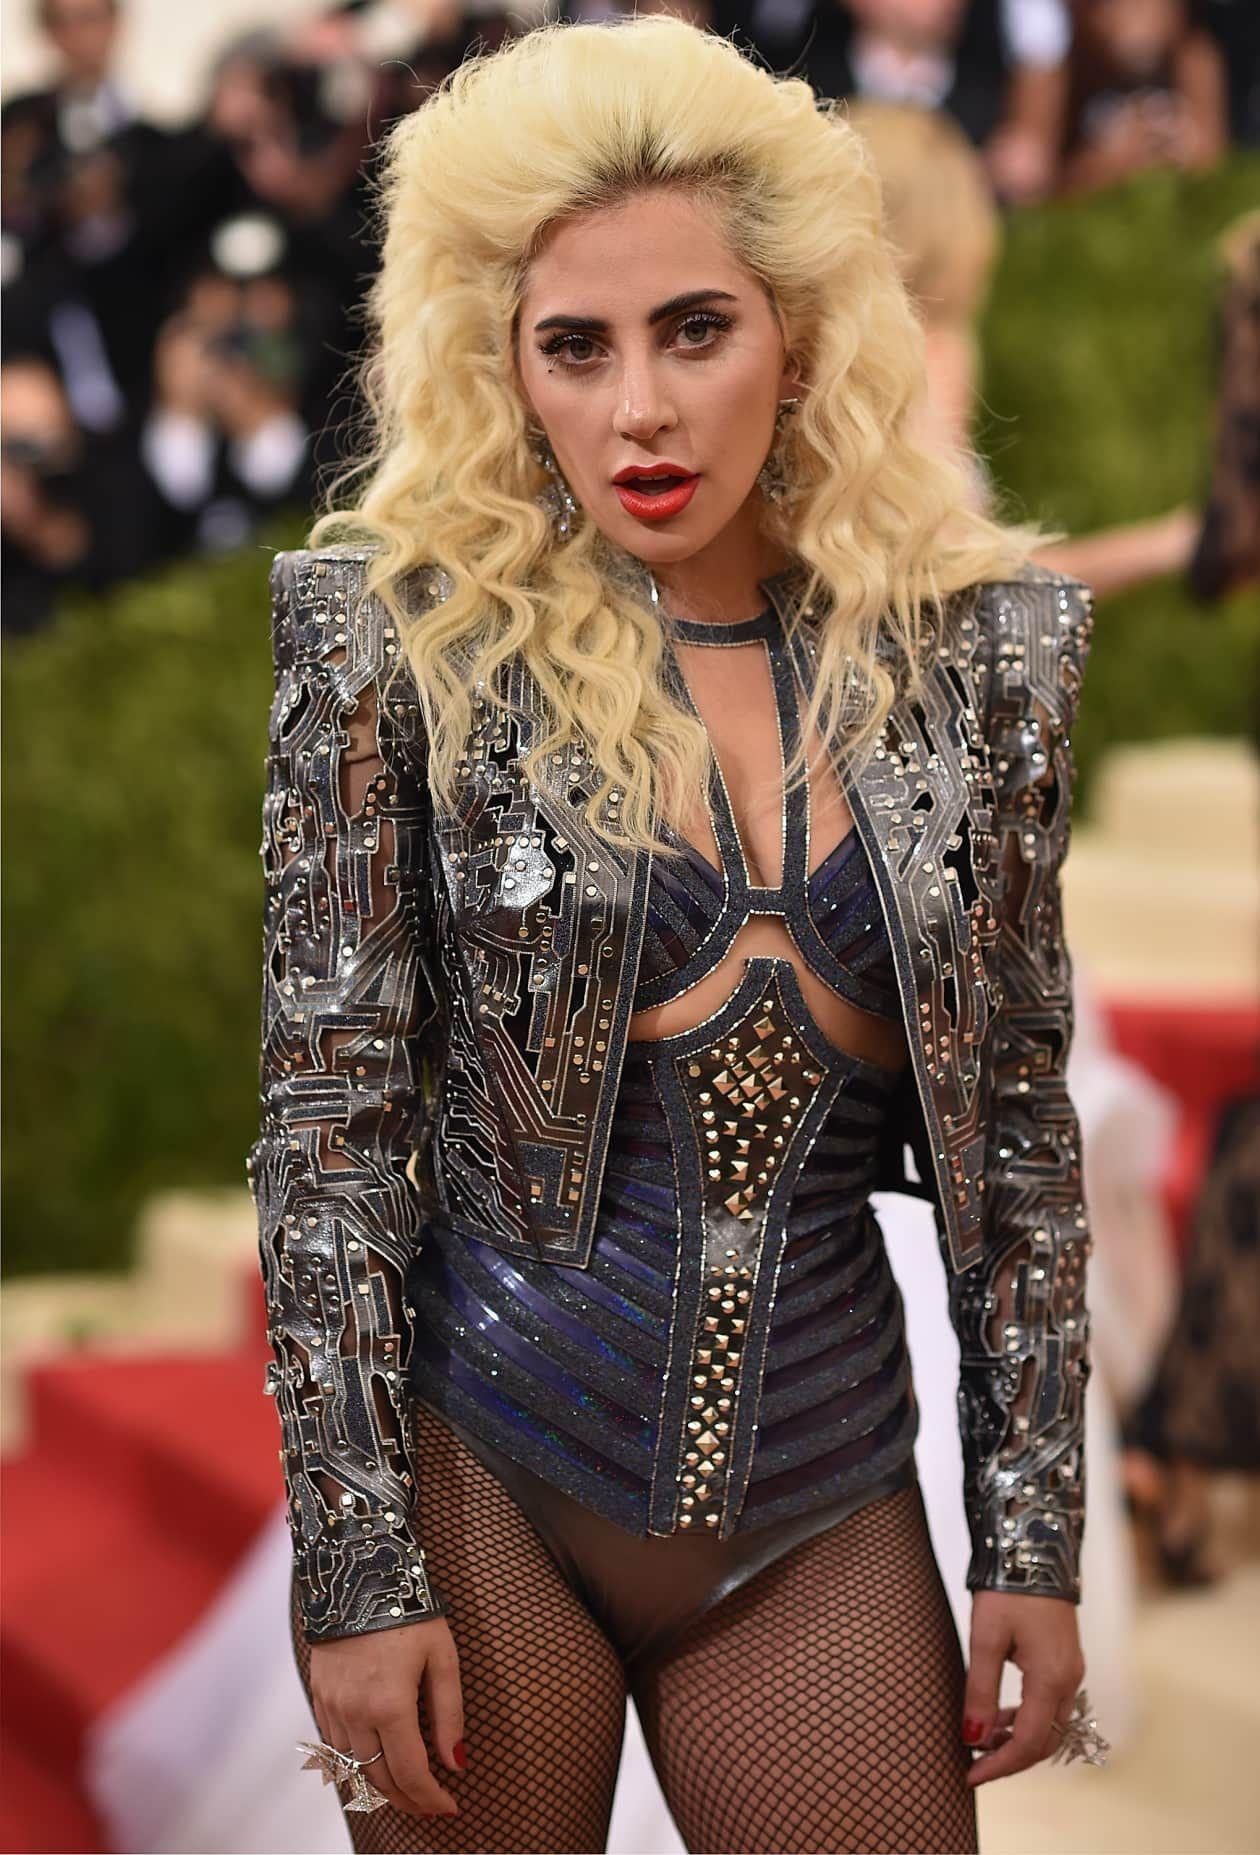 Report: Lady Gaga Will Headline The Super Bowl 2017 ...